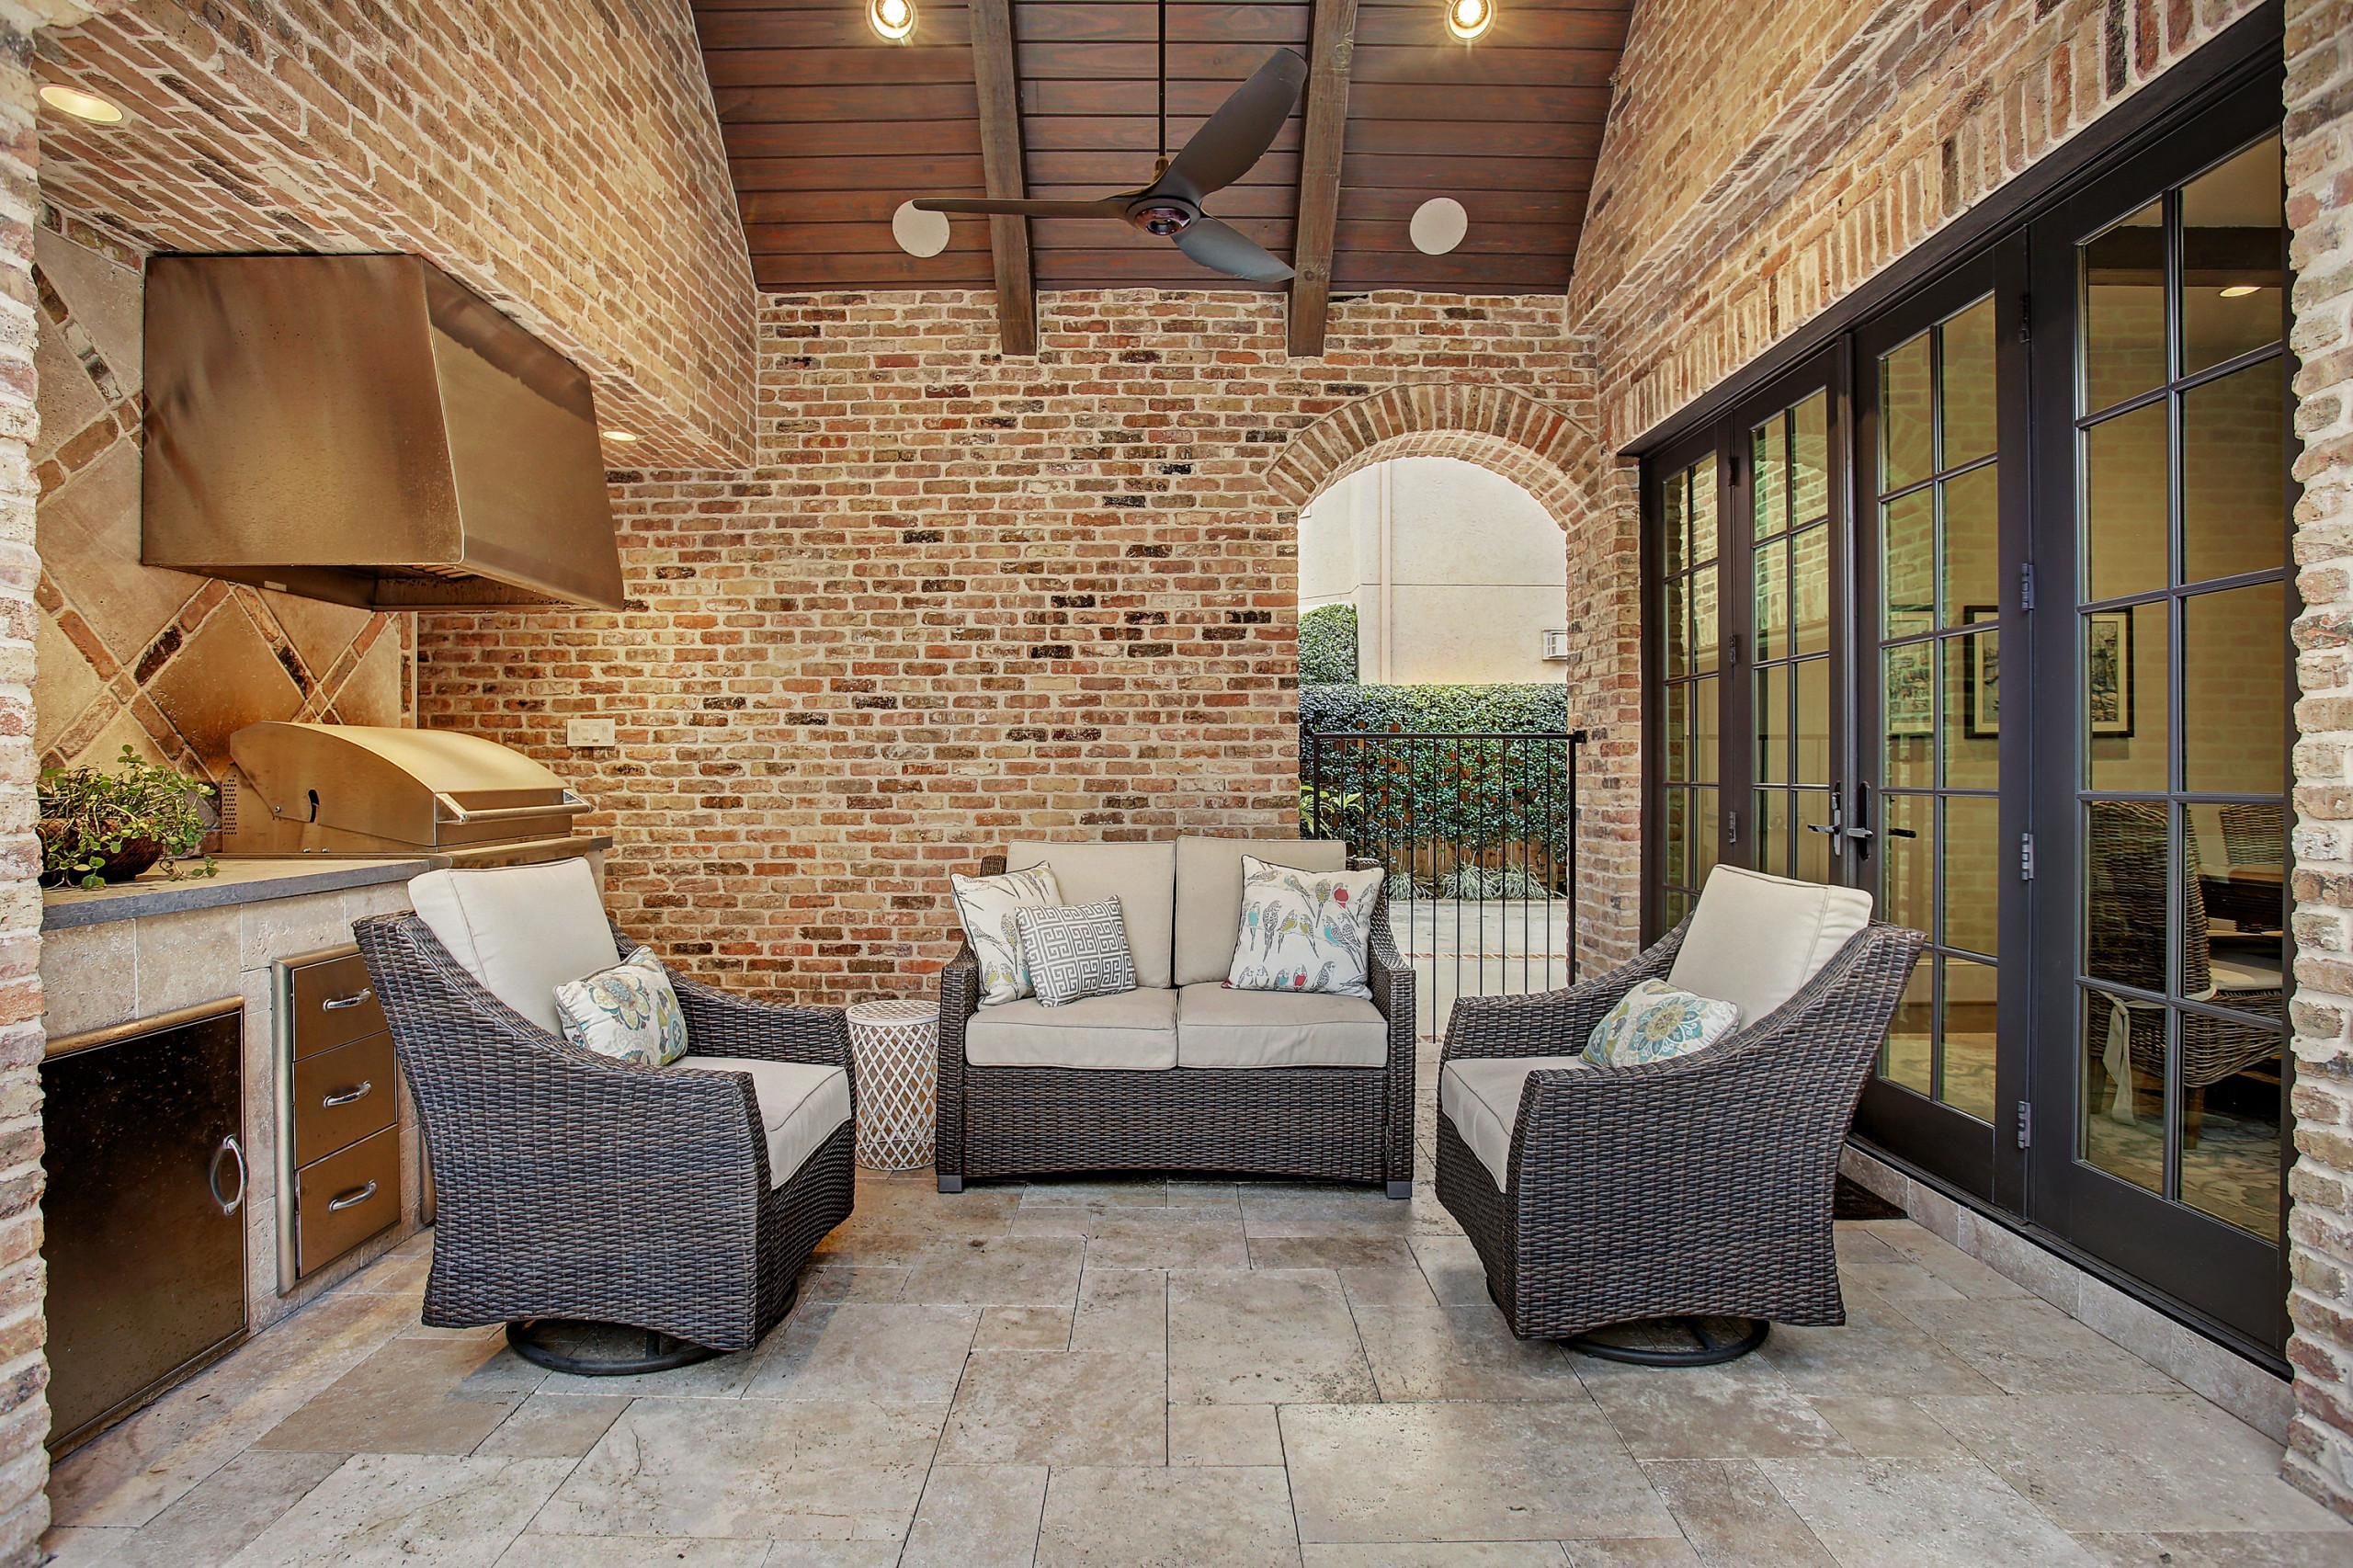 Amazing Memorial Park Brick Home